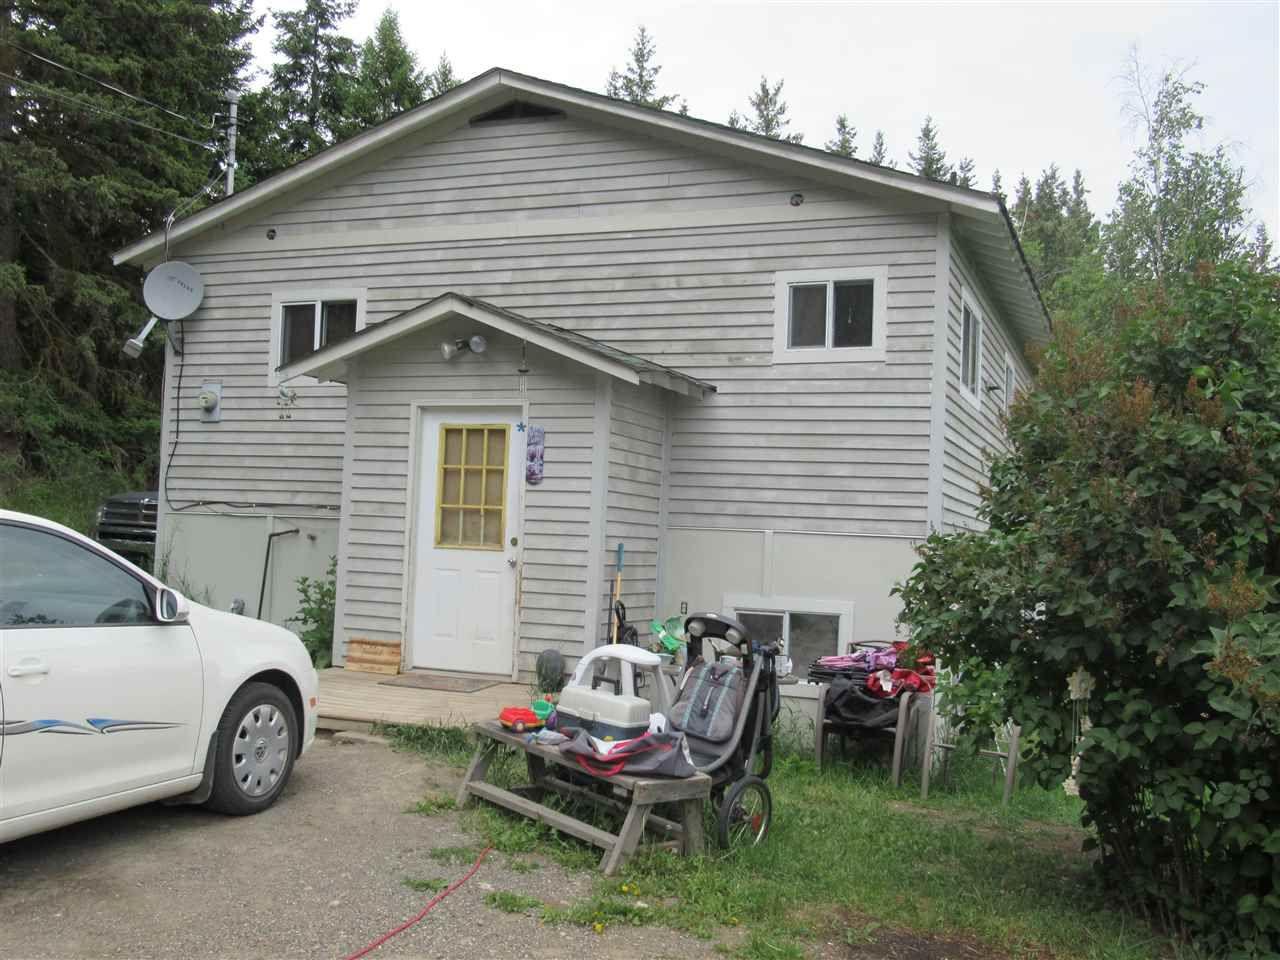 Photo 13: Photos: 950 HODGSON Road in Williams Lake: Esler/Dog Creek House for sale (Williams Lake (Zone 27))  : MLS®# R2383953